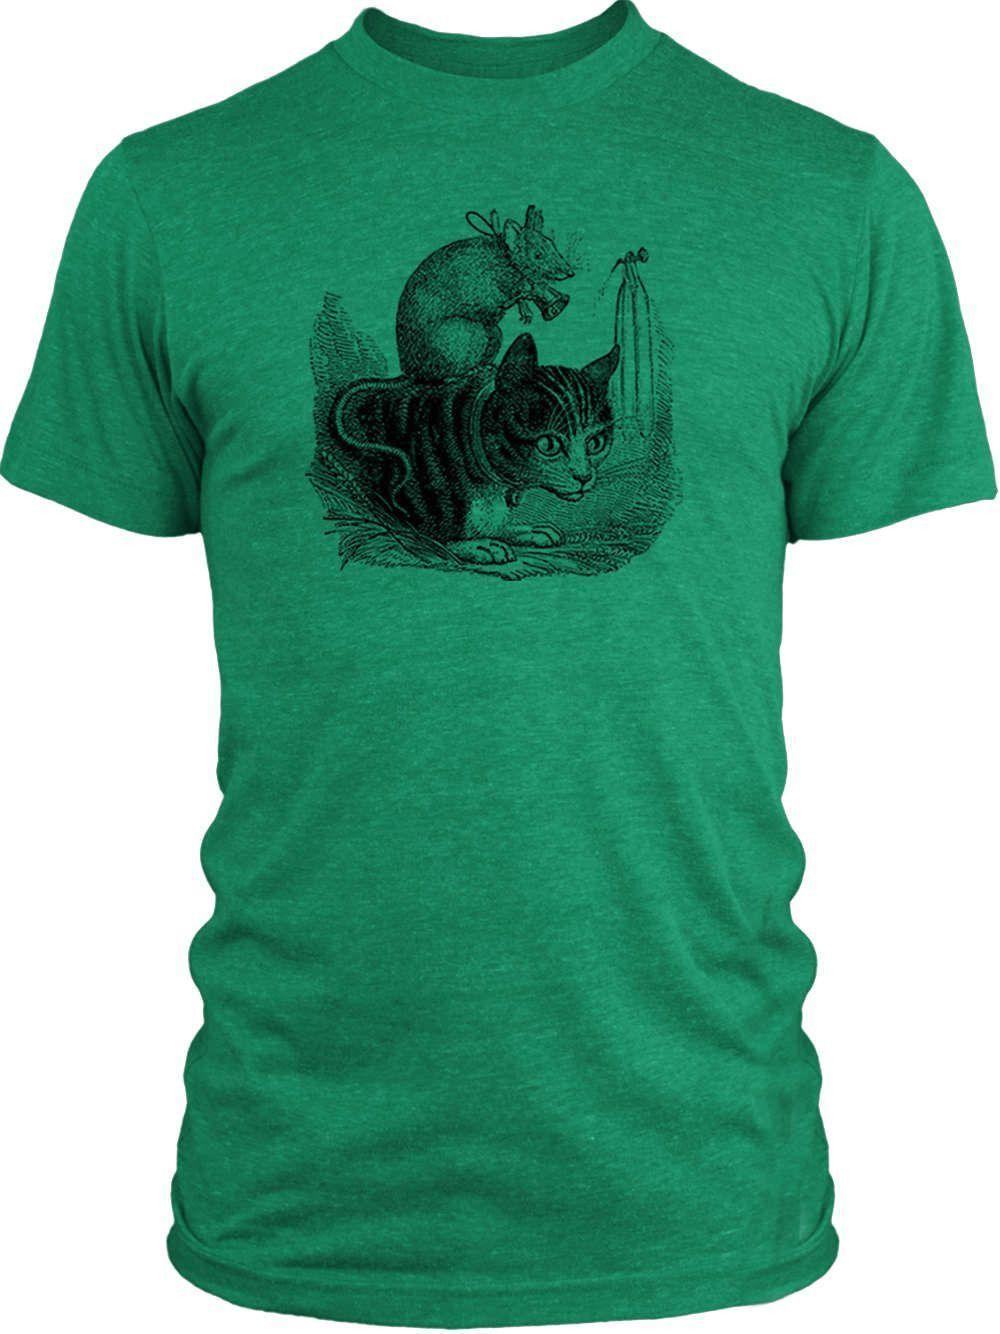 Big Texas Cat and Mouse (Black) Vintage Tri-Blend T-Shirt